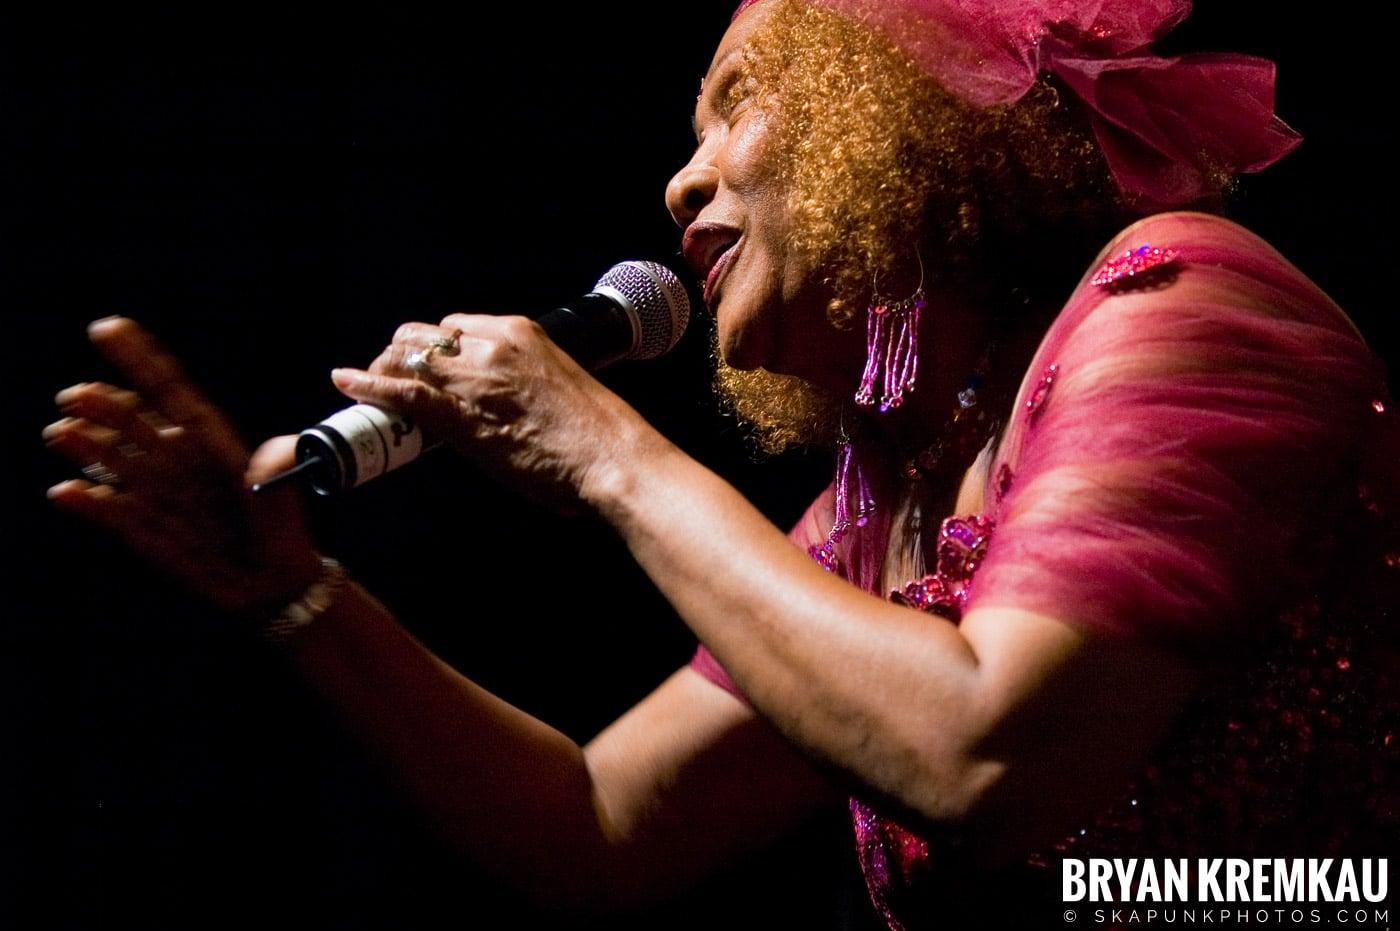 Marcia Griffiths @ Vintage Reggae Fest - Hammerstein Ballroom, NYC - 12.16.2007 (12)